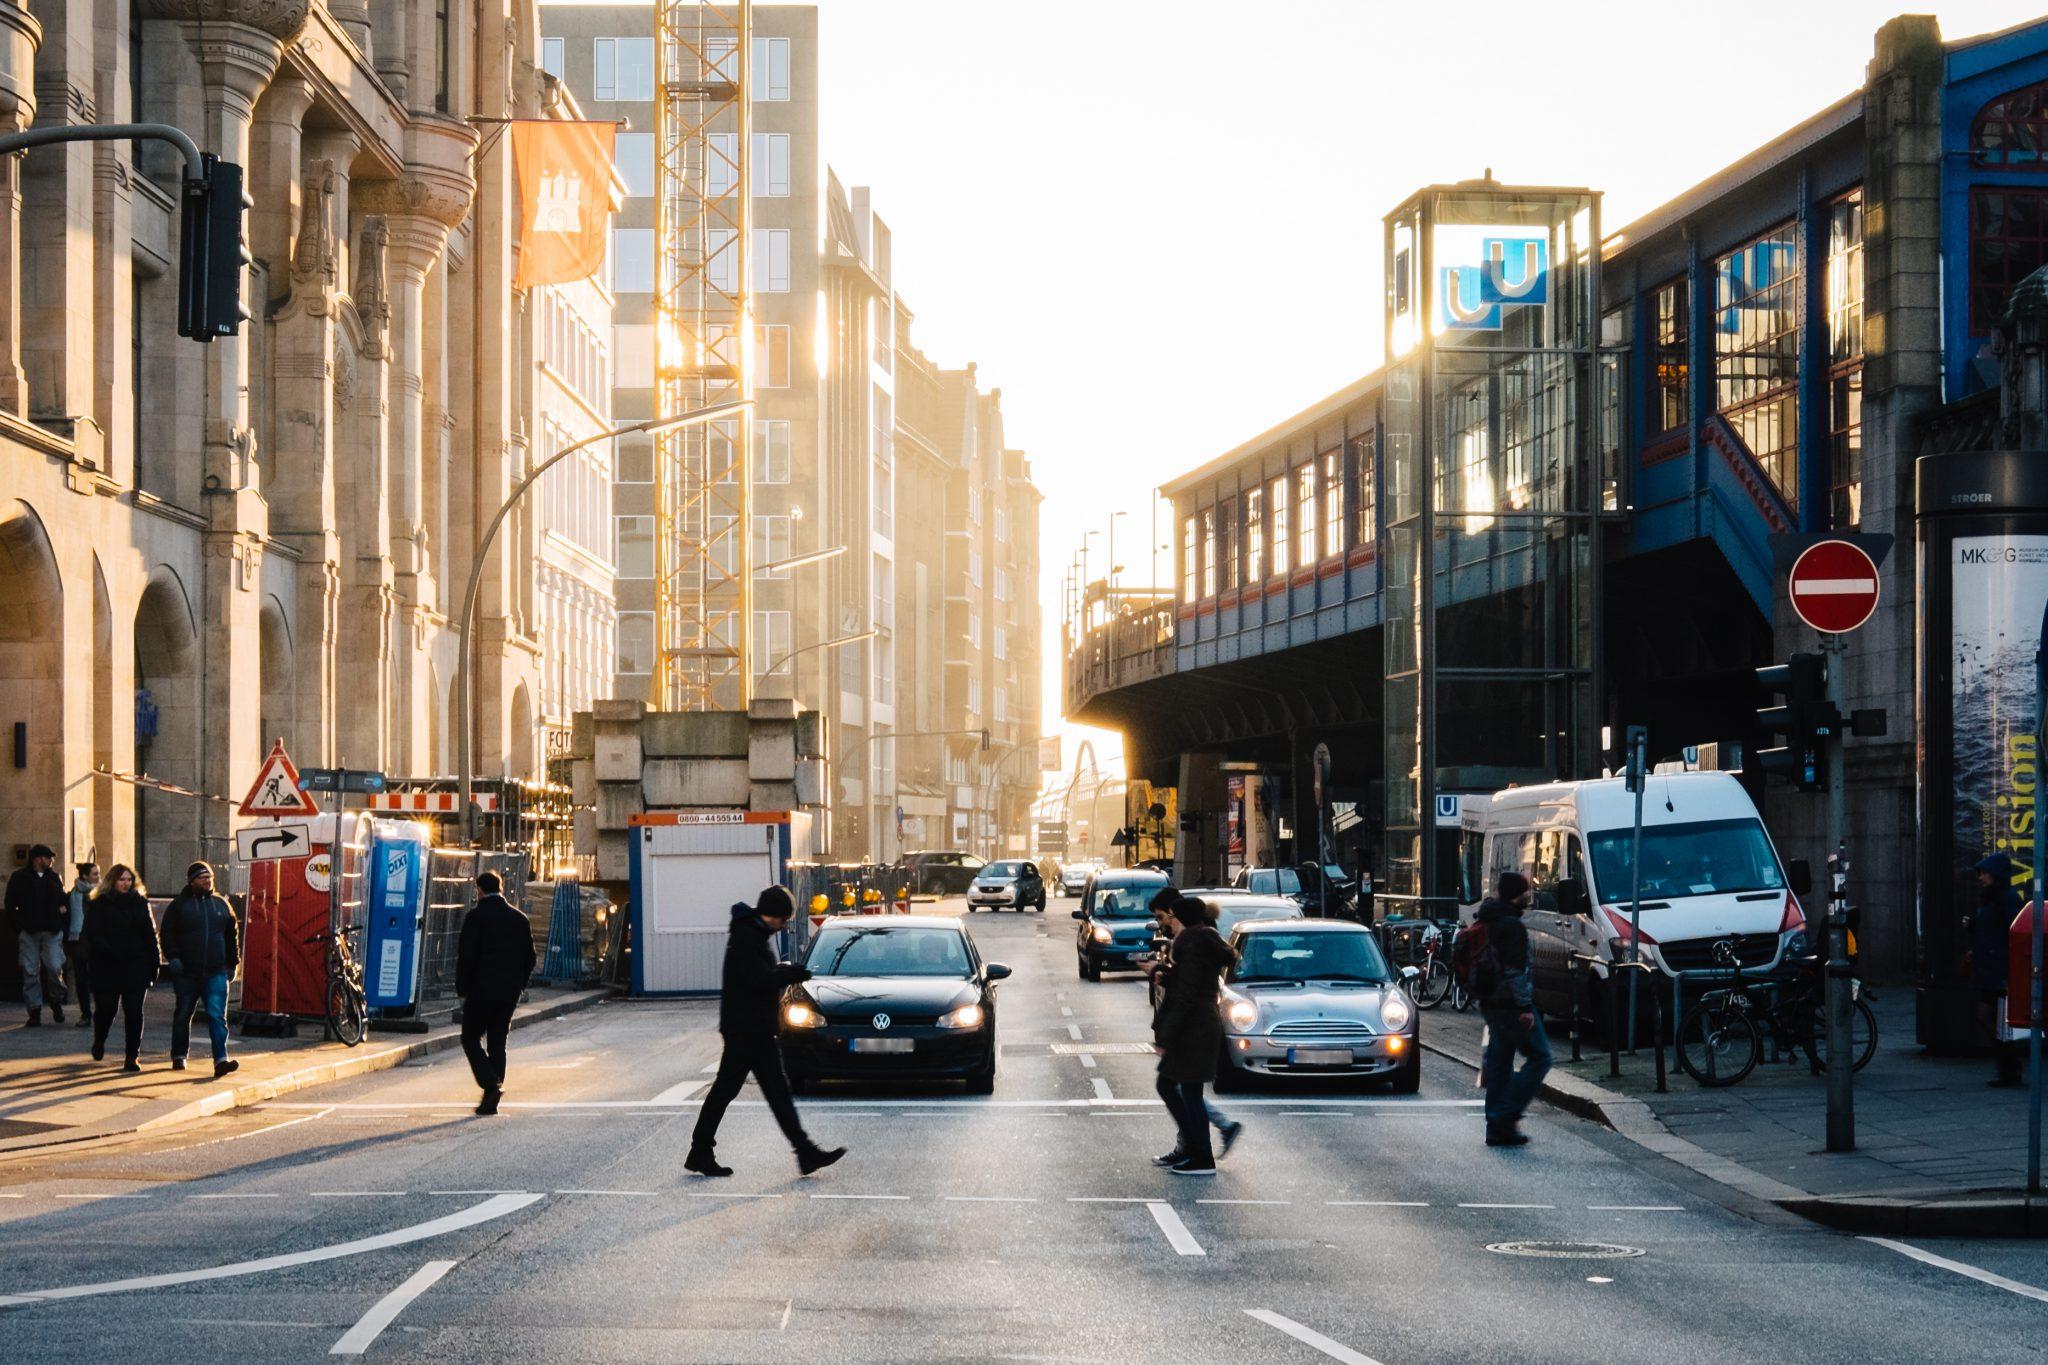 Street Photography, People, Hamburg, Urban